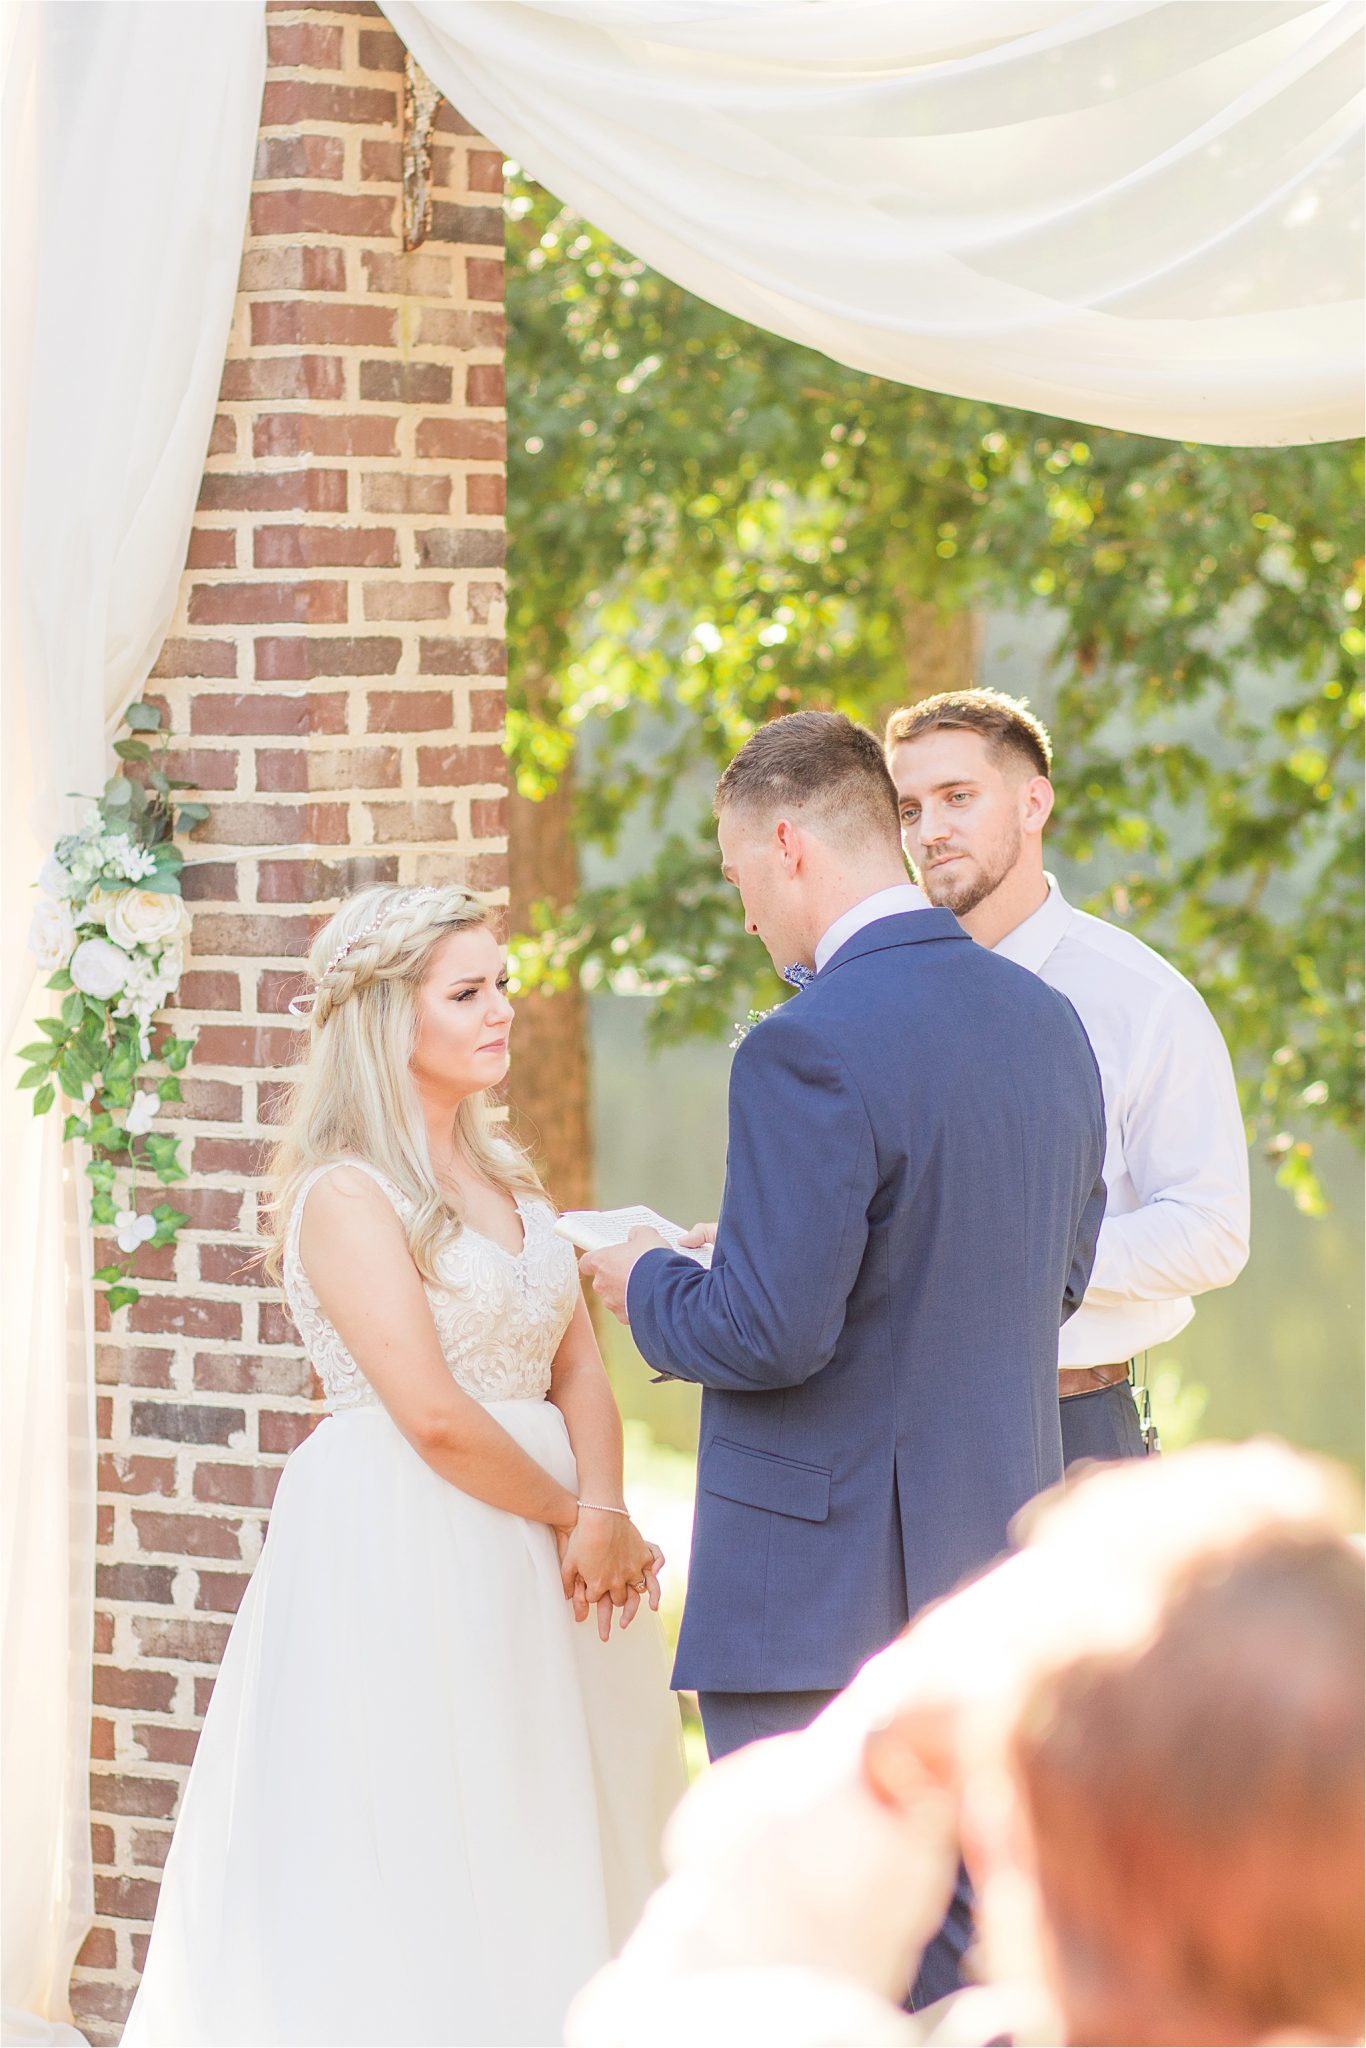 wedding-ceremony-alabama-wedding-photographer-blue-navy-vows